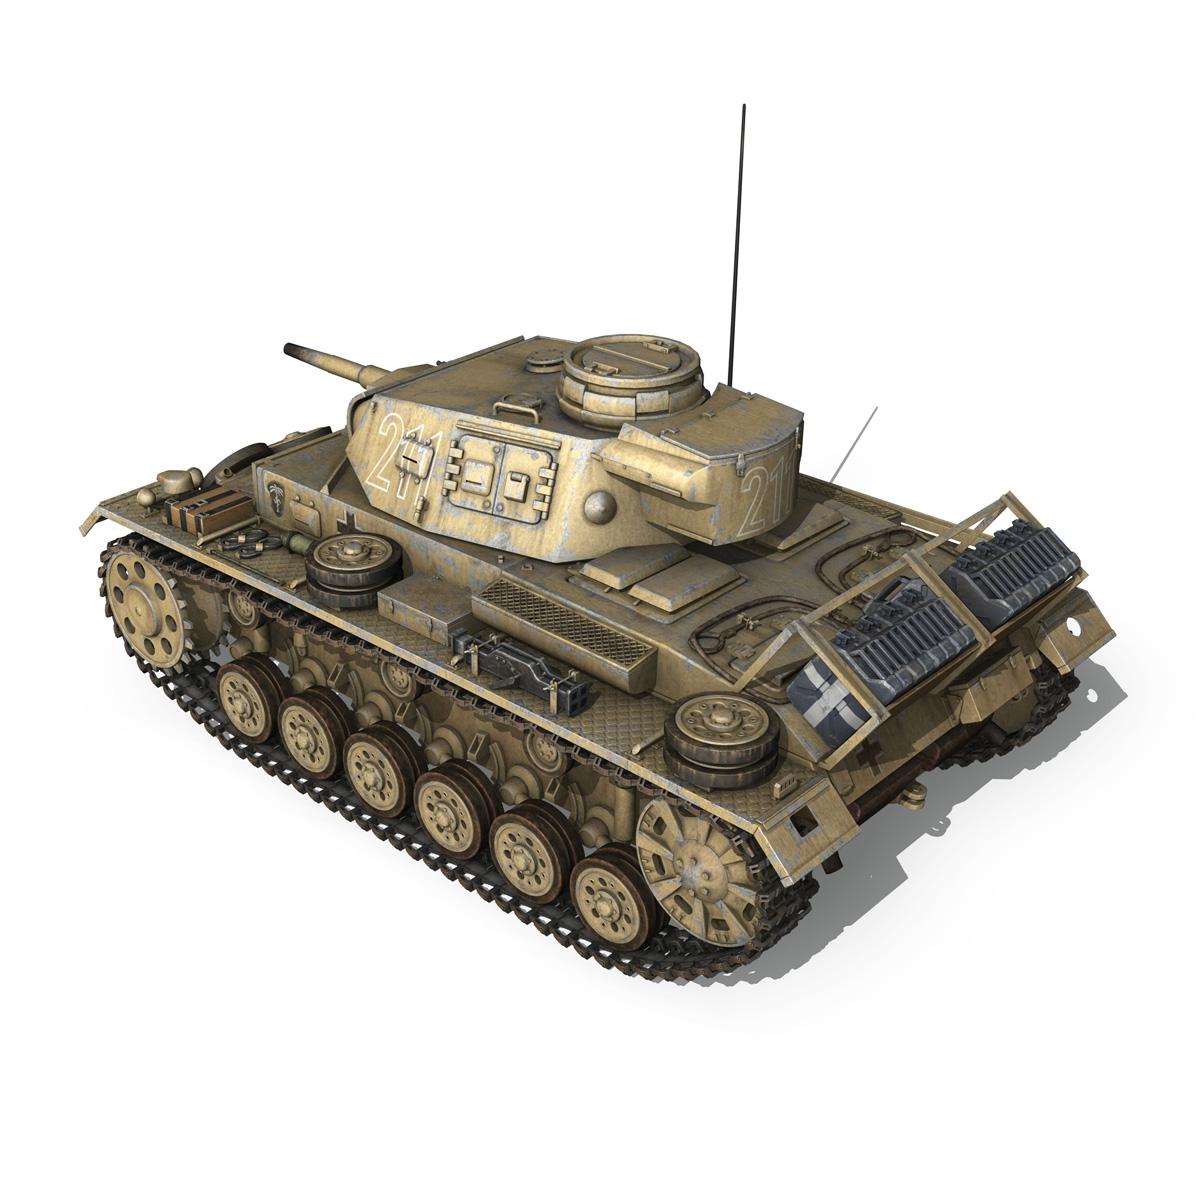 pzkpfw iii – panzer 3 – ausf.g – dak – 211 3d model 3ds c4d fbx lwo lw lws obj 266466